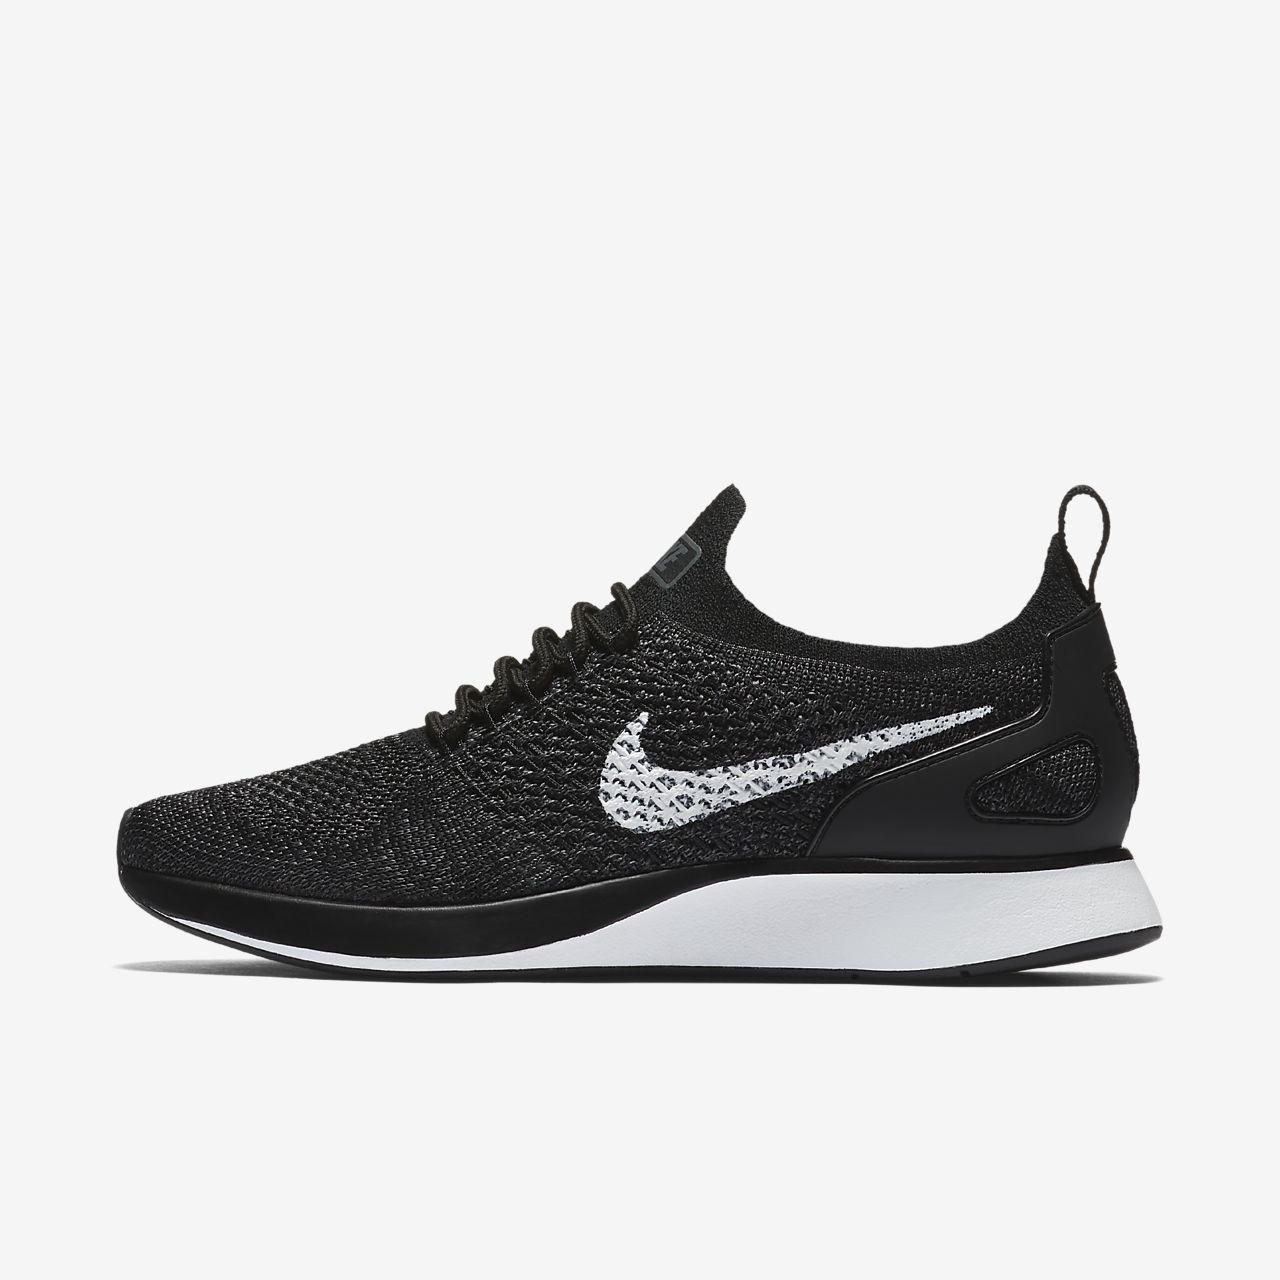 Nike Footballs Shoes Plus